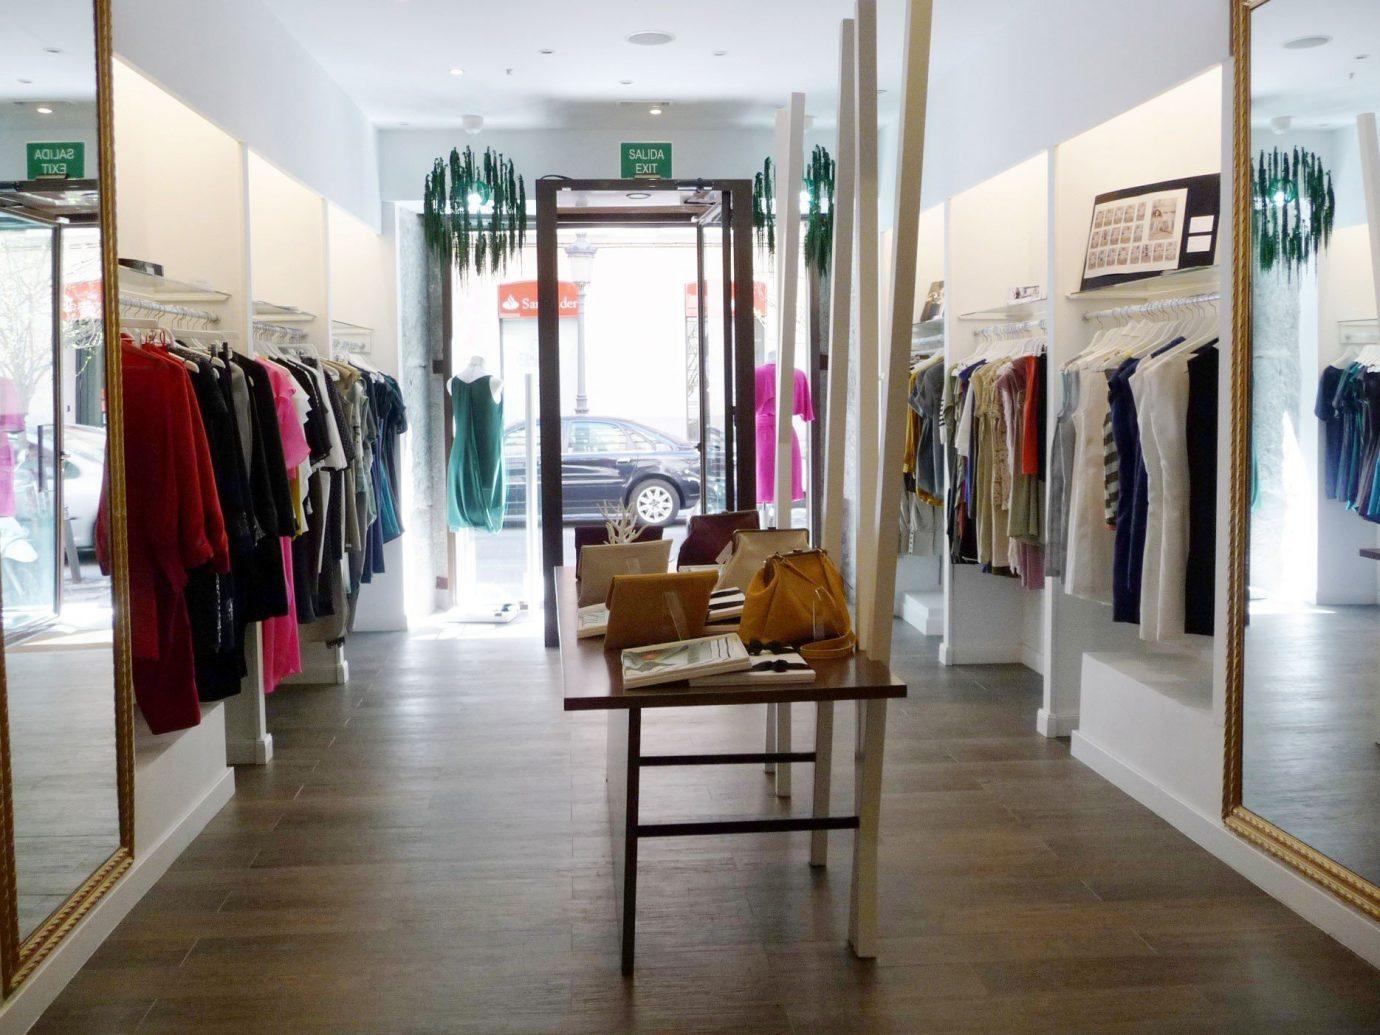 Trip Ideas floor indoor room Boutique scene building gallery retail interior design Design tourist attraction several